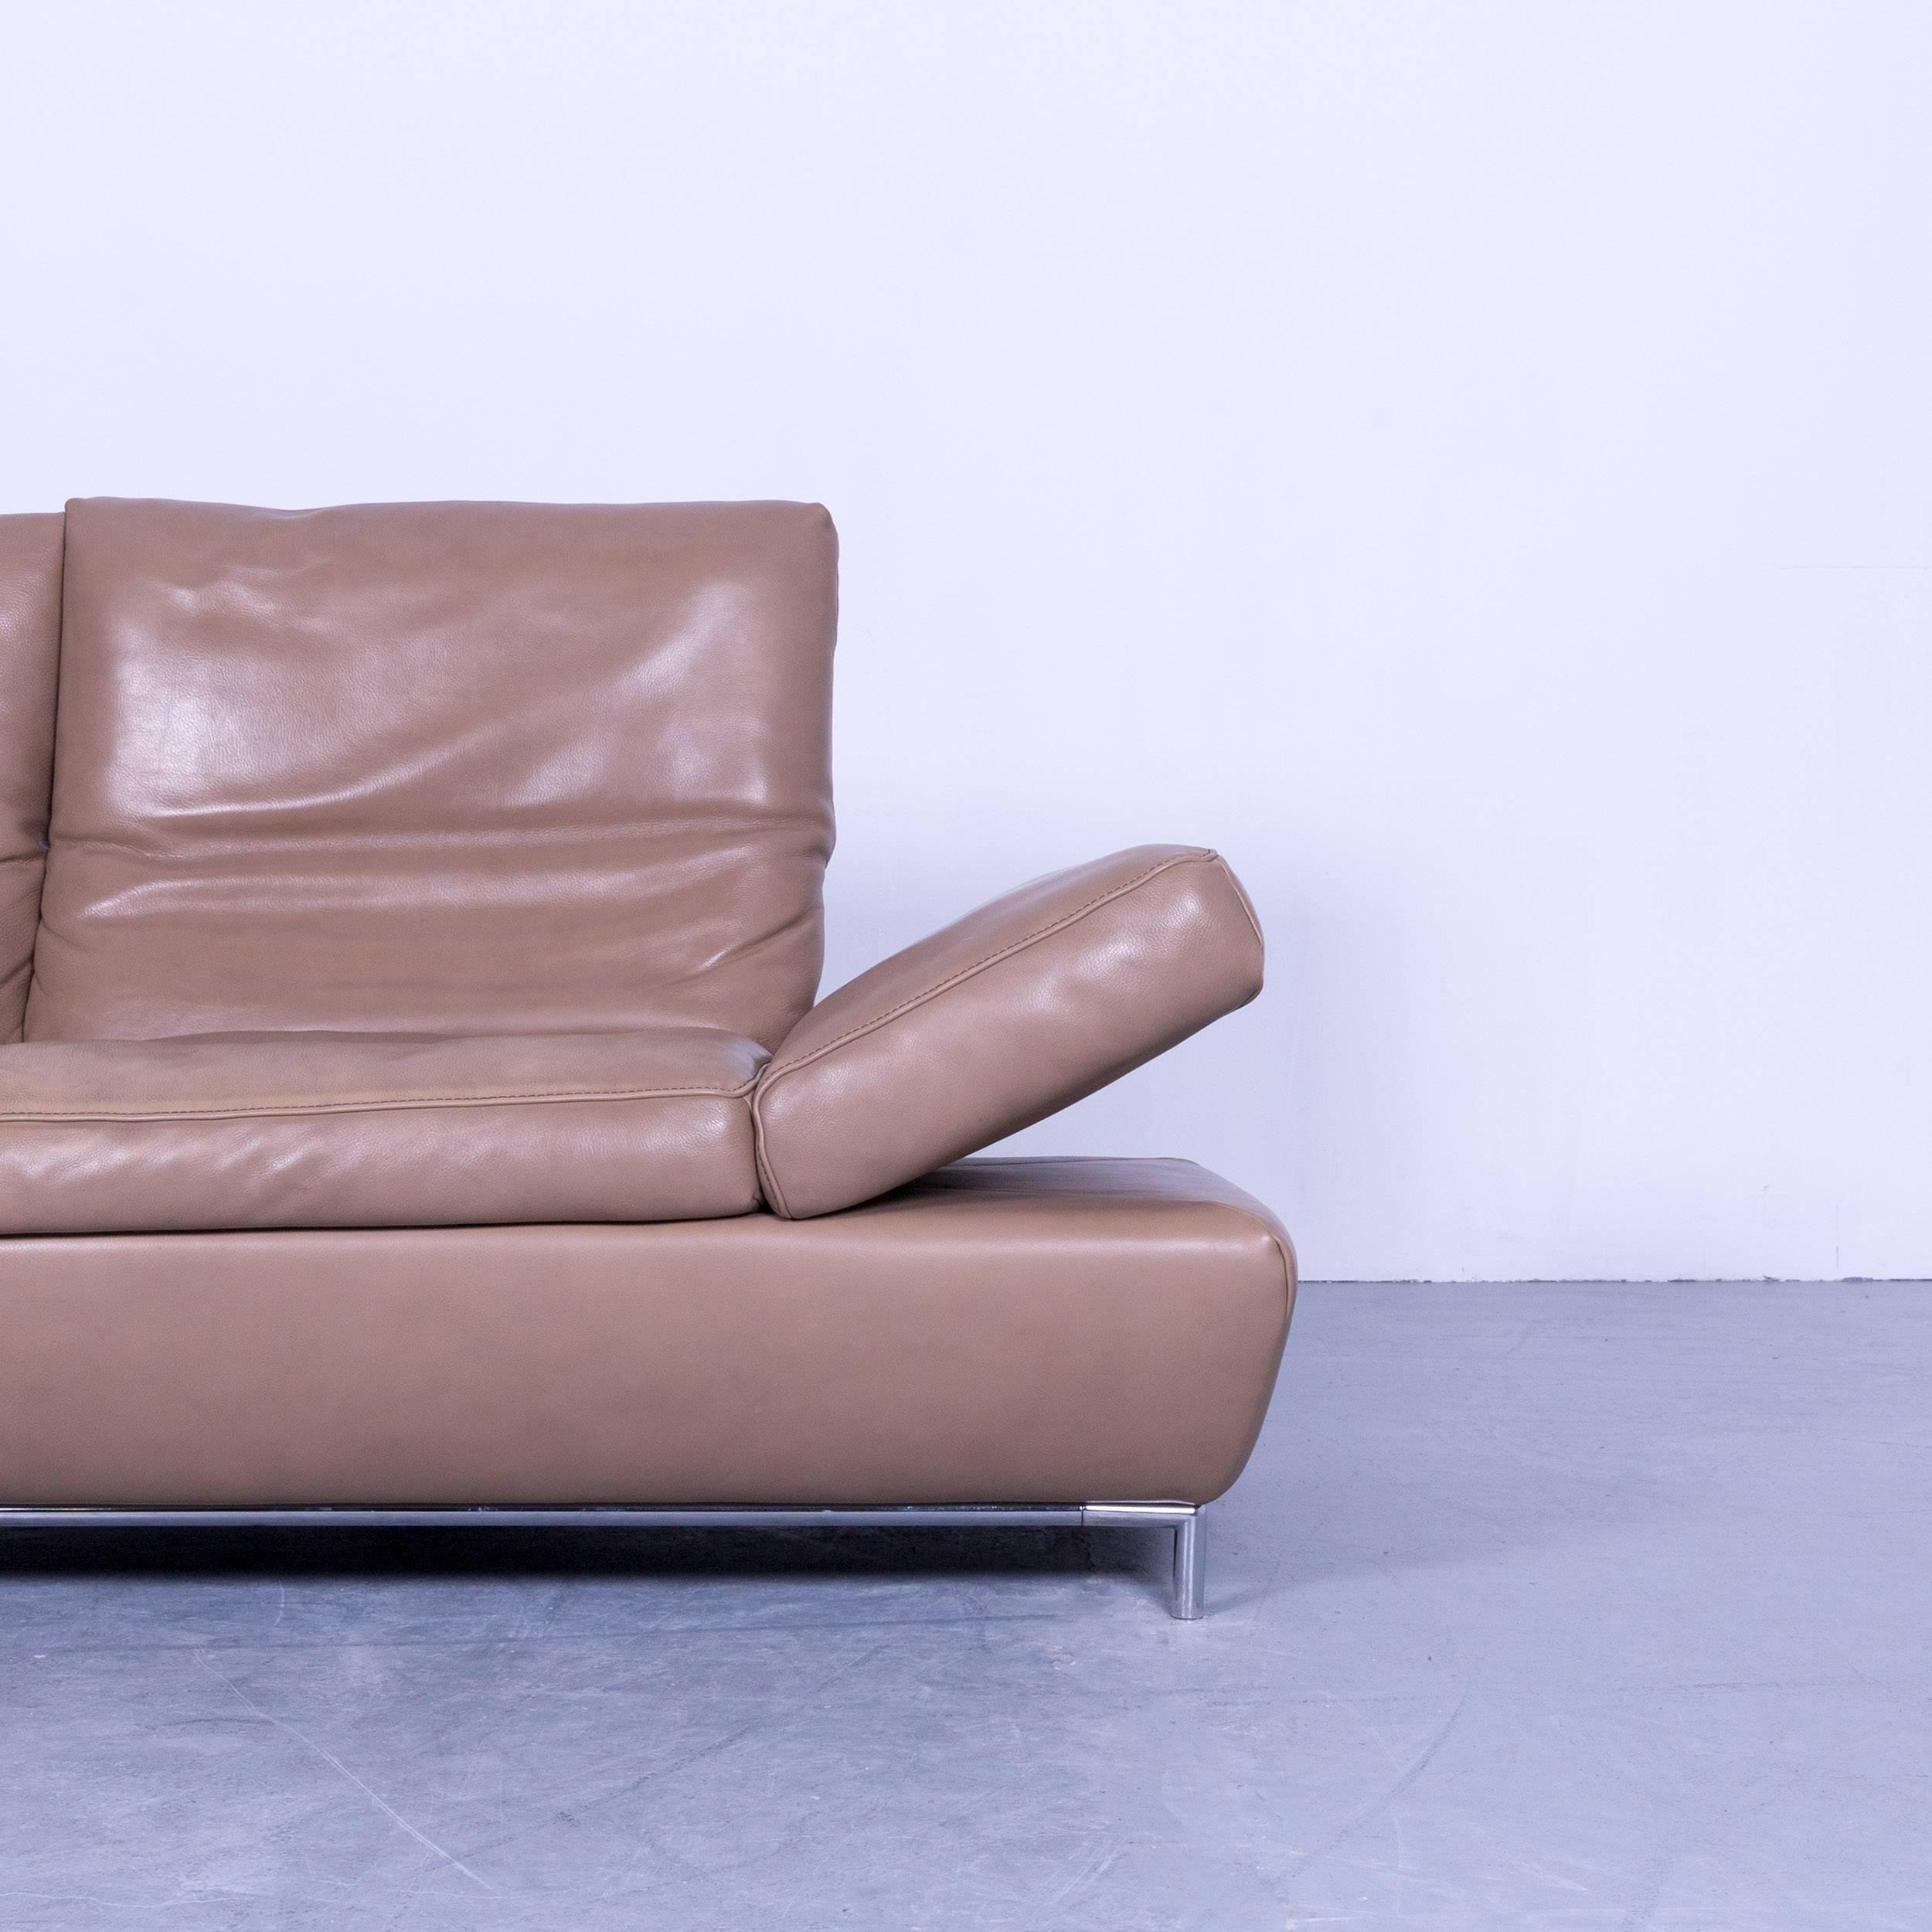 Koinor Designer Three Seat Sofa In Light Brown In A Minimalistic And Modern  Design,